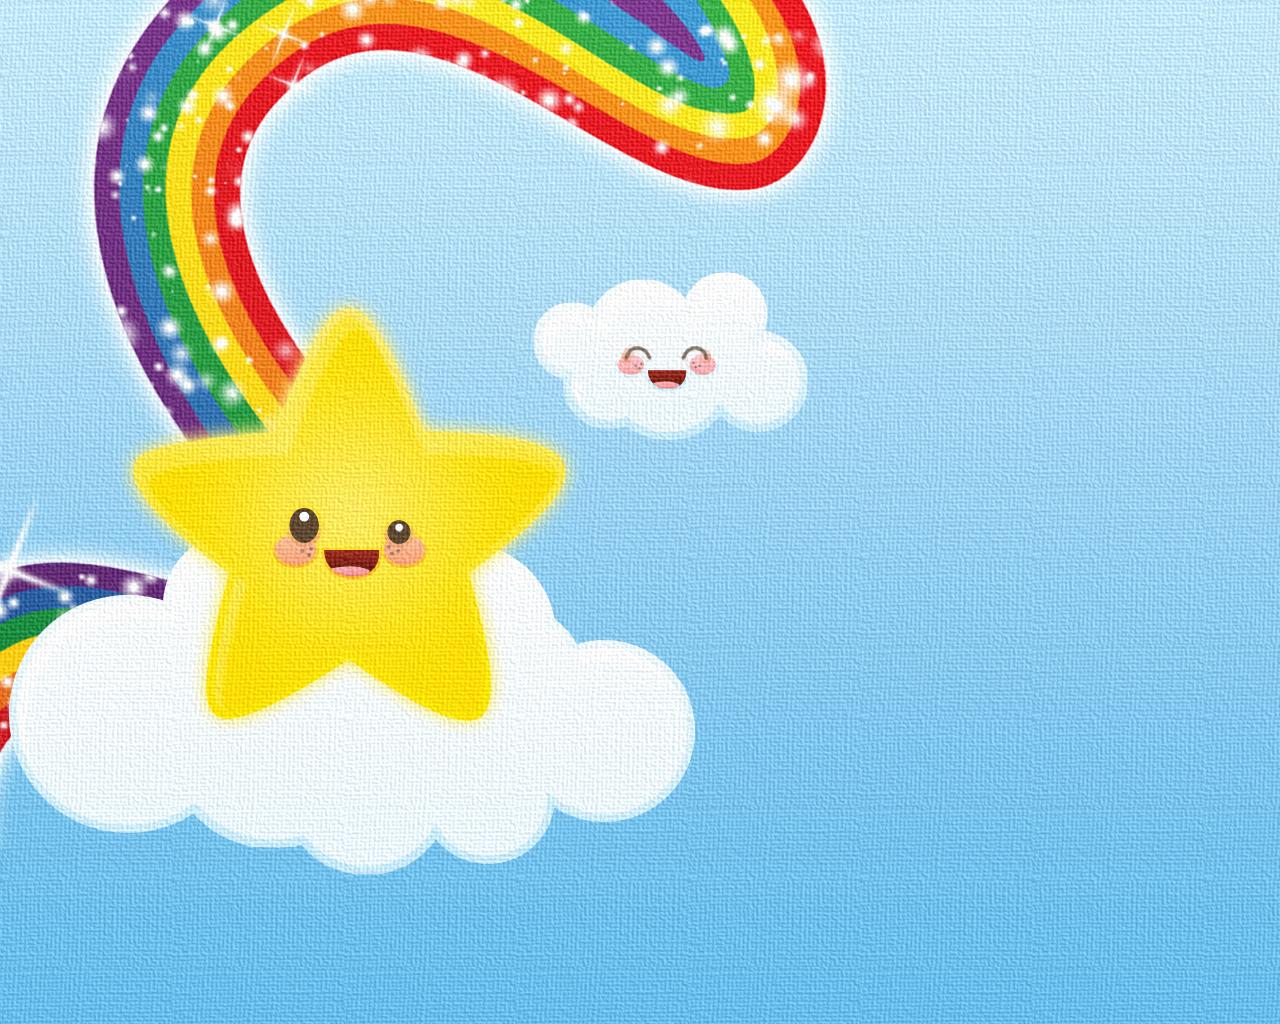 Rainbow Star Kawaii Cute Wallpaper